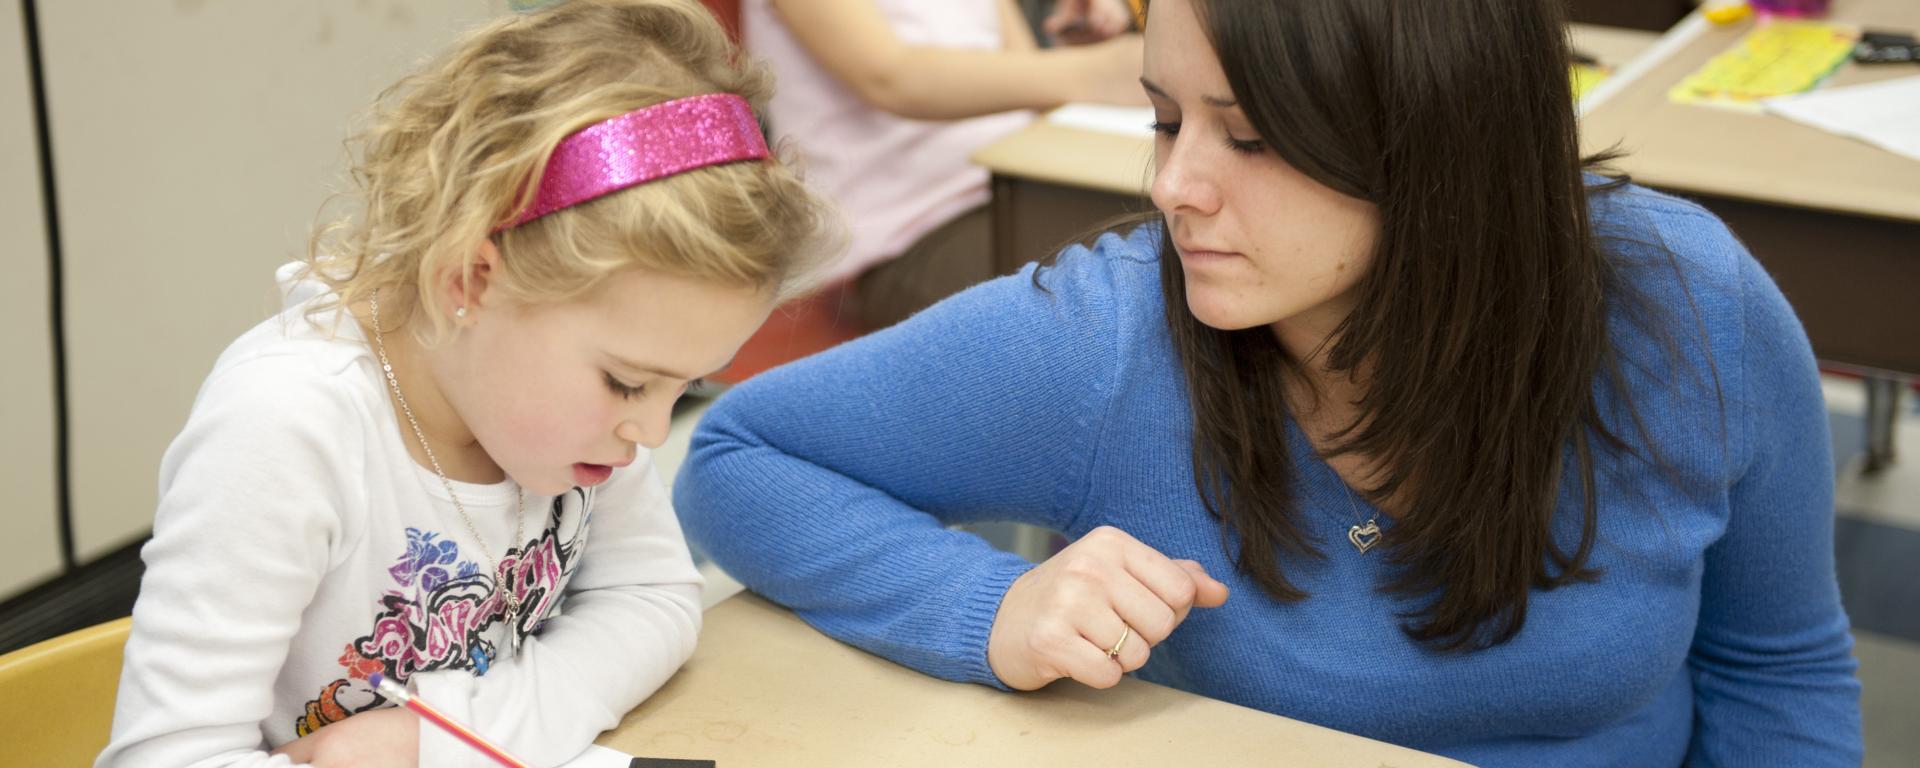 Childhood Education Grades 1 6 Bs Suny Oswego Academic Programs